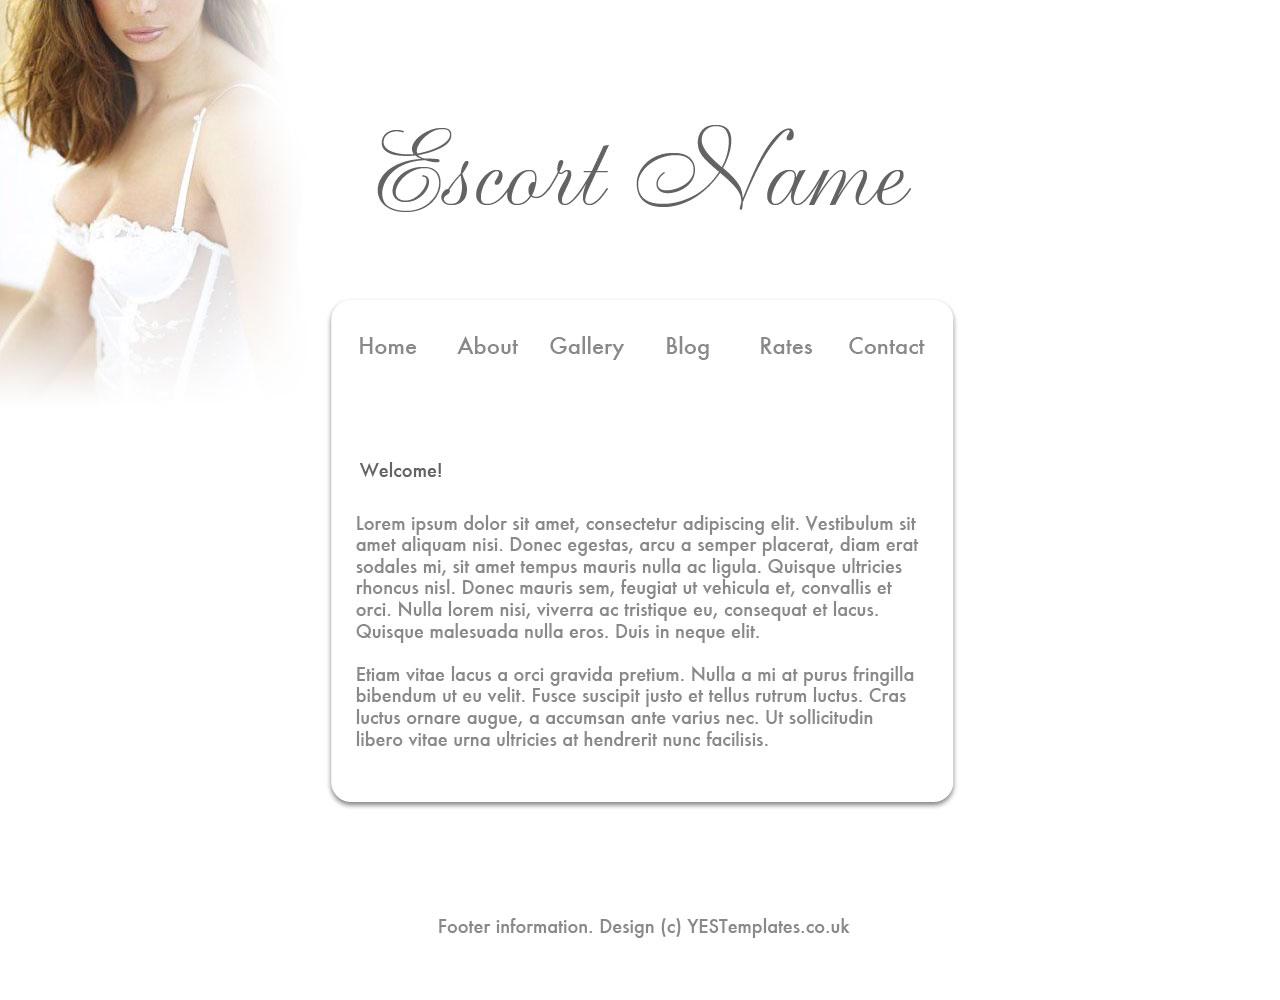 Your Escort Site - Template - White Haze